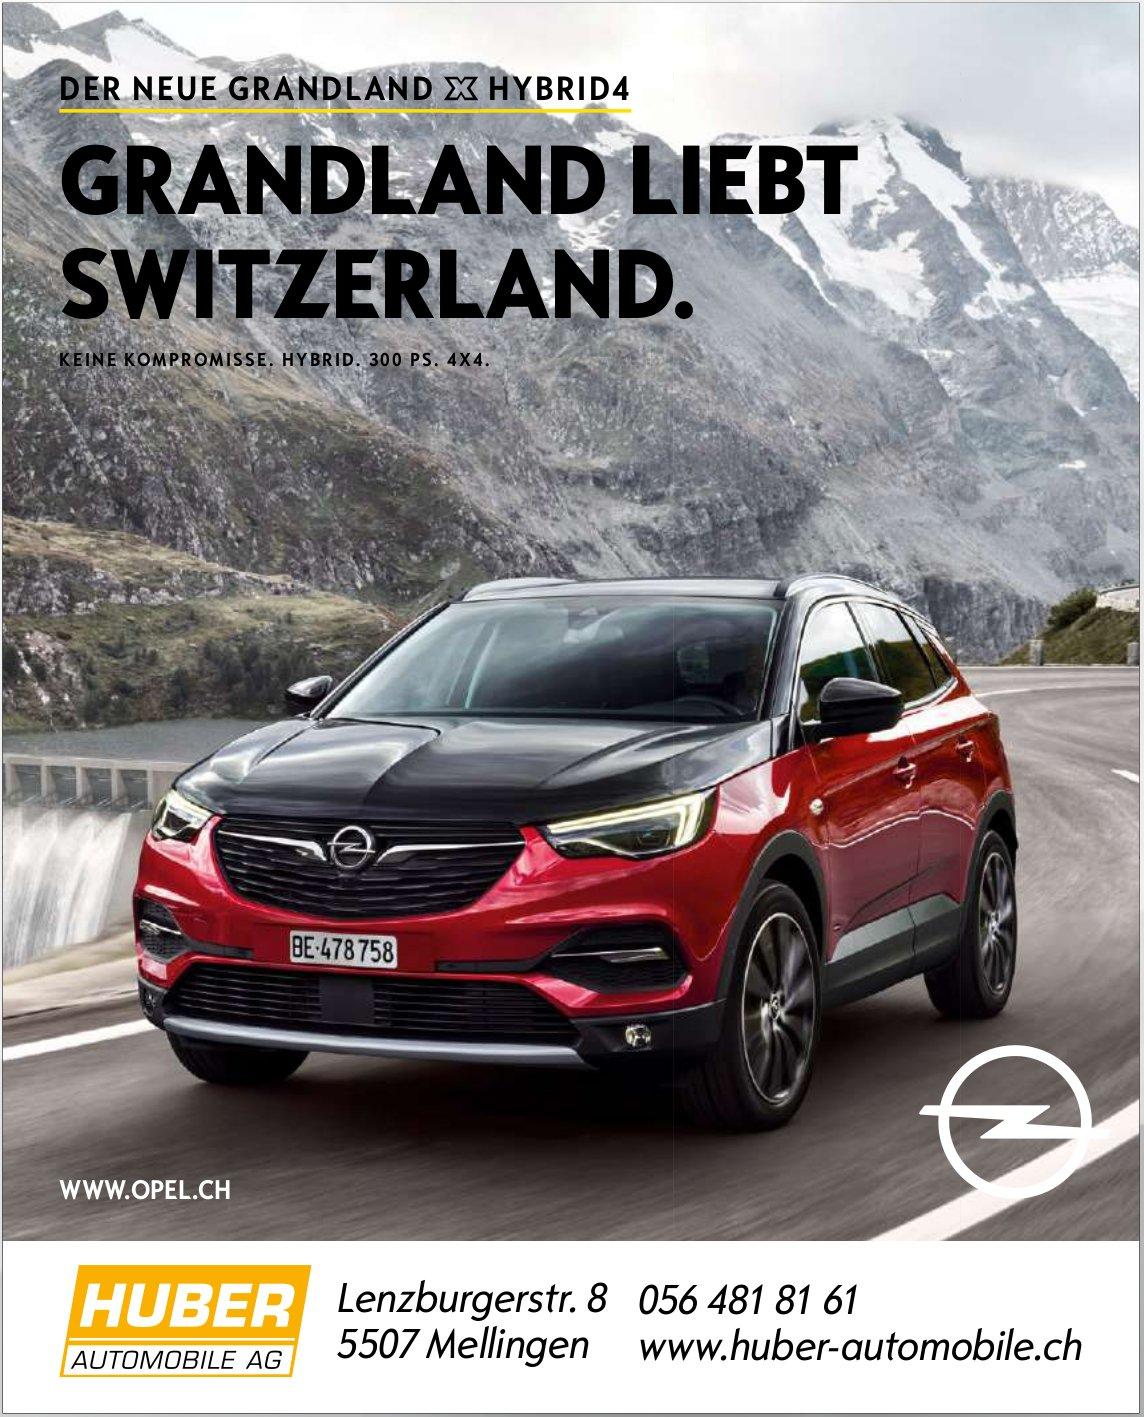 HUBER AUTOMOBILE AG - DER NEUE OPEL GRANDLAND HYBRID4